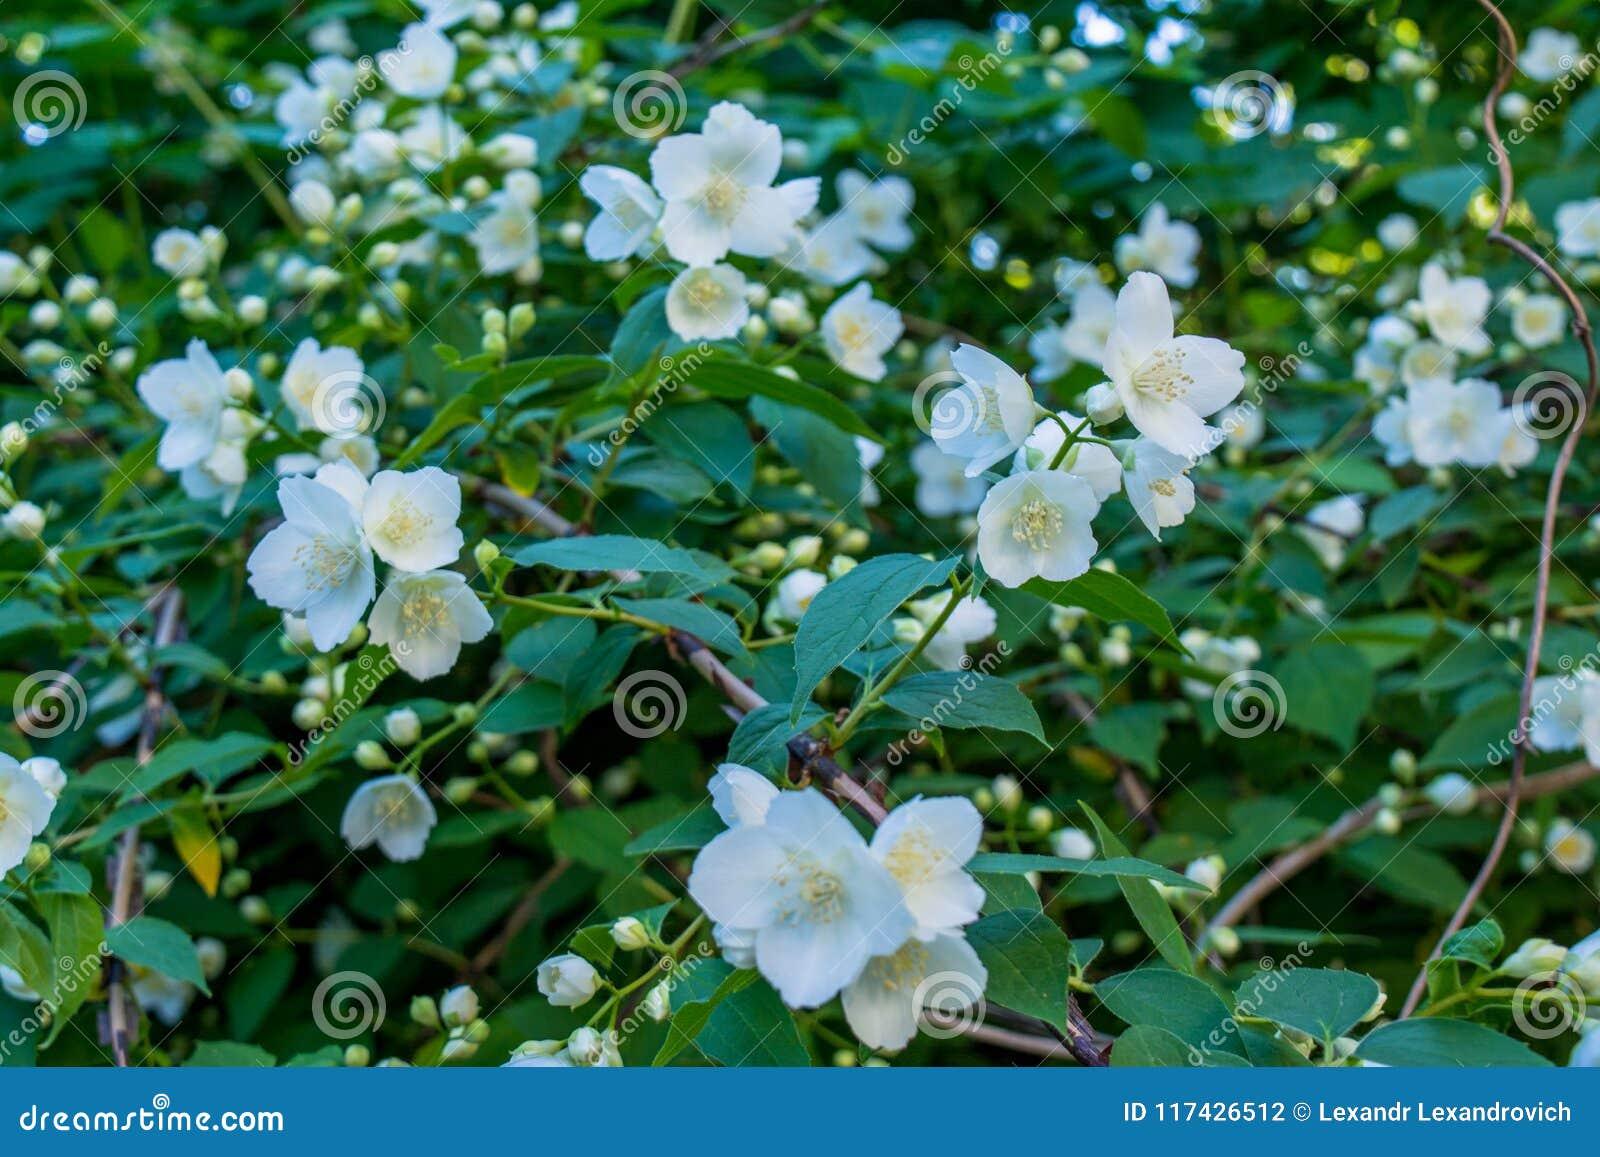 Amazing White Jasmine Flowers On The Bush In The Garden Stock Photo